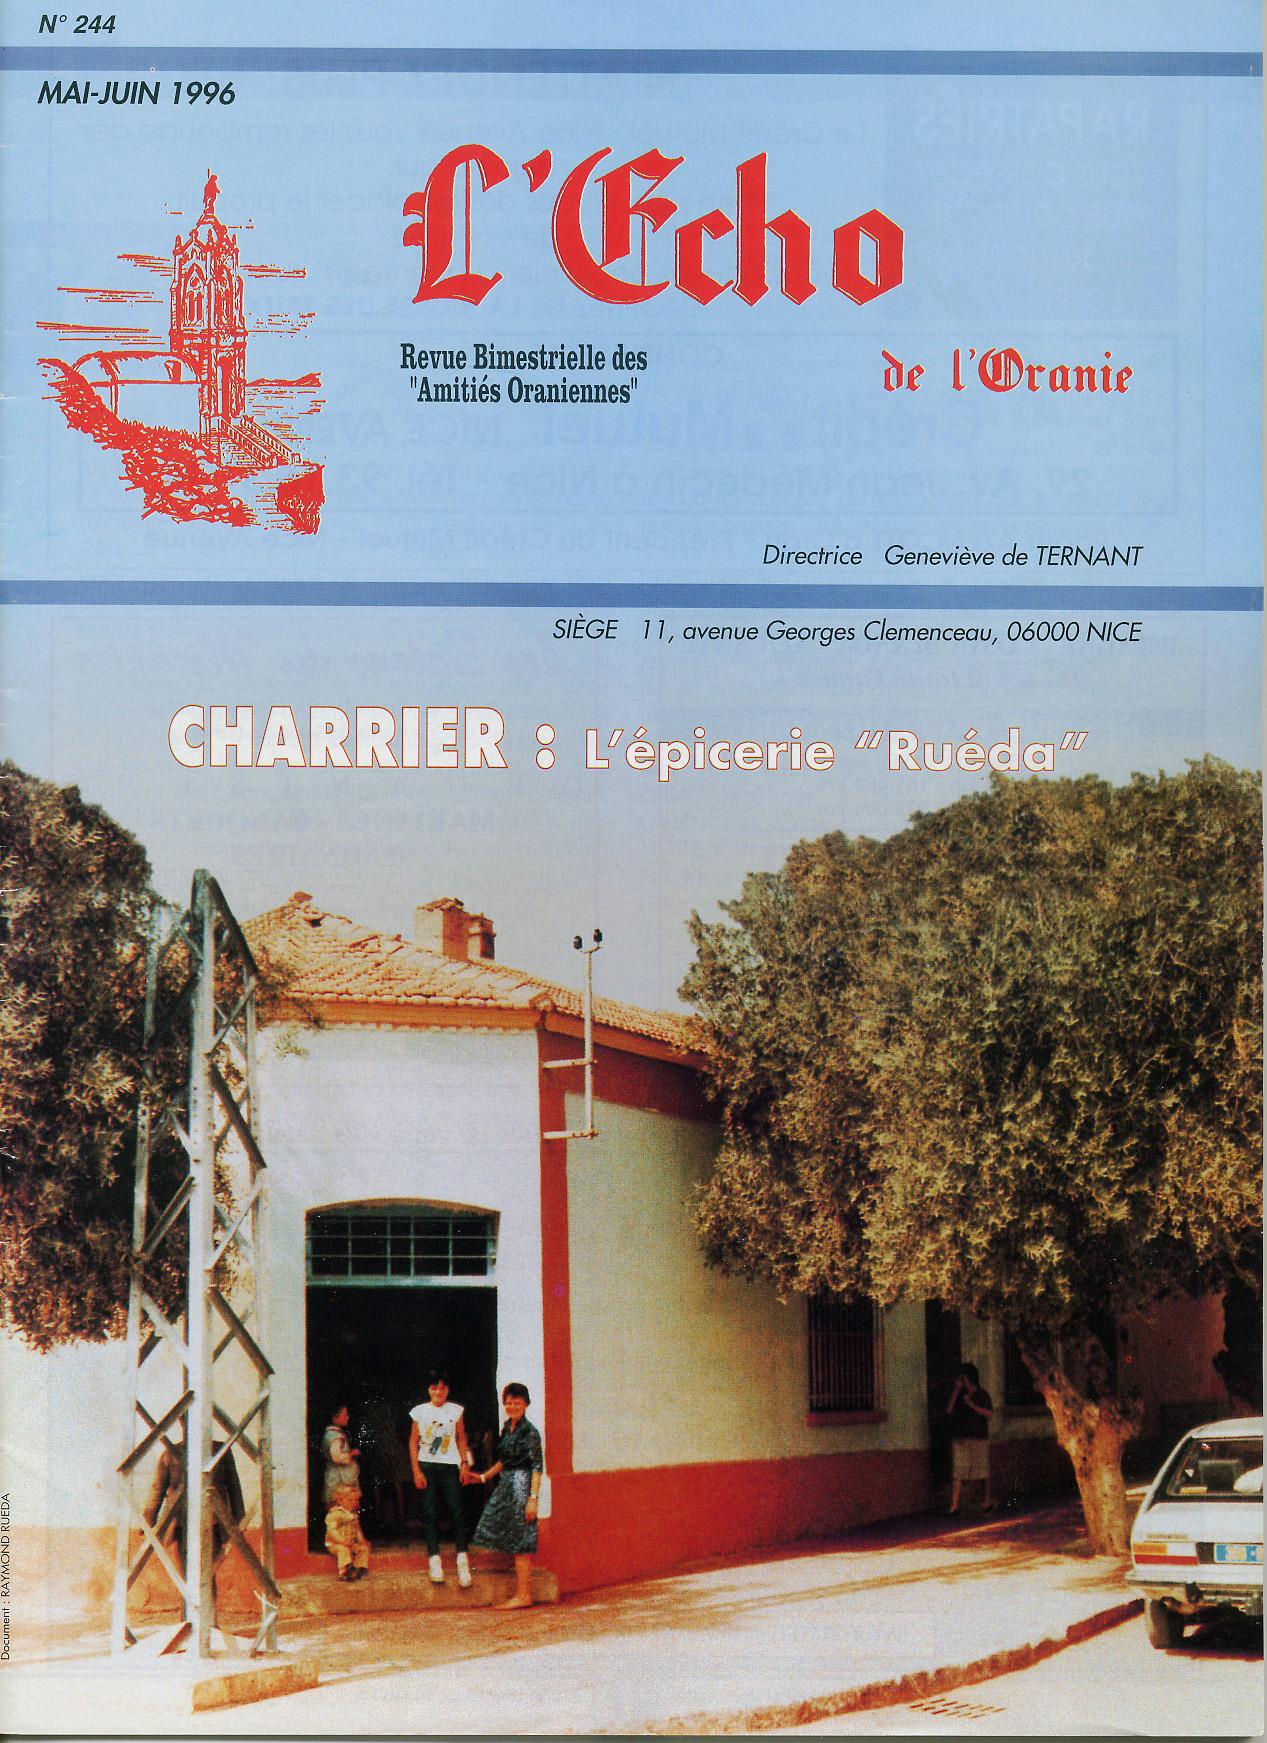 Echo de l'Oranie - n°244 - mai 1996